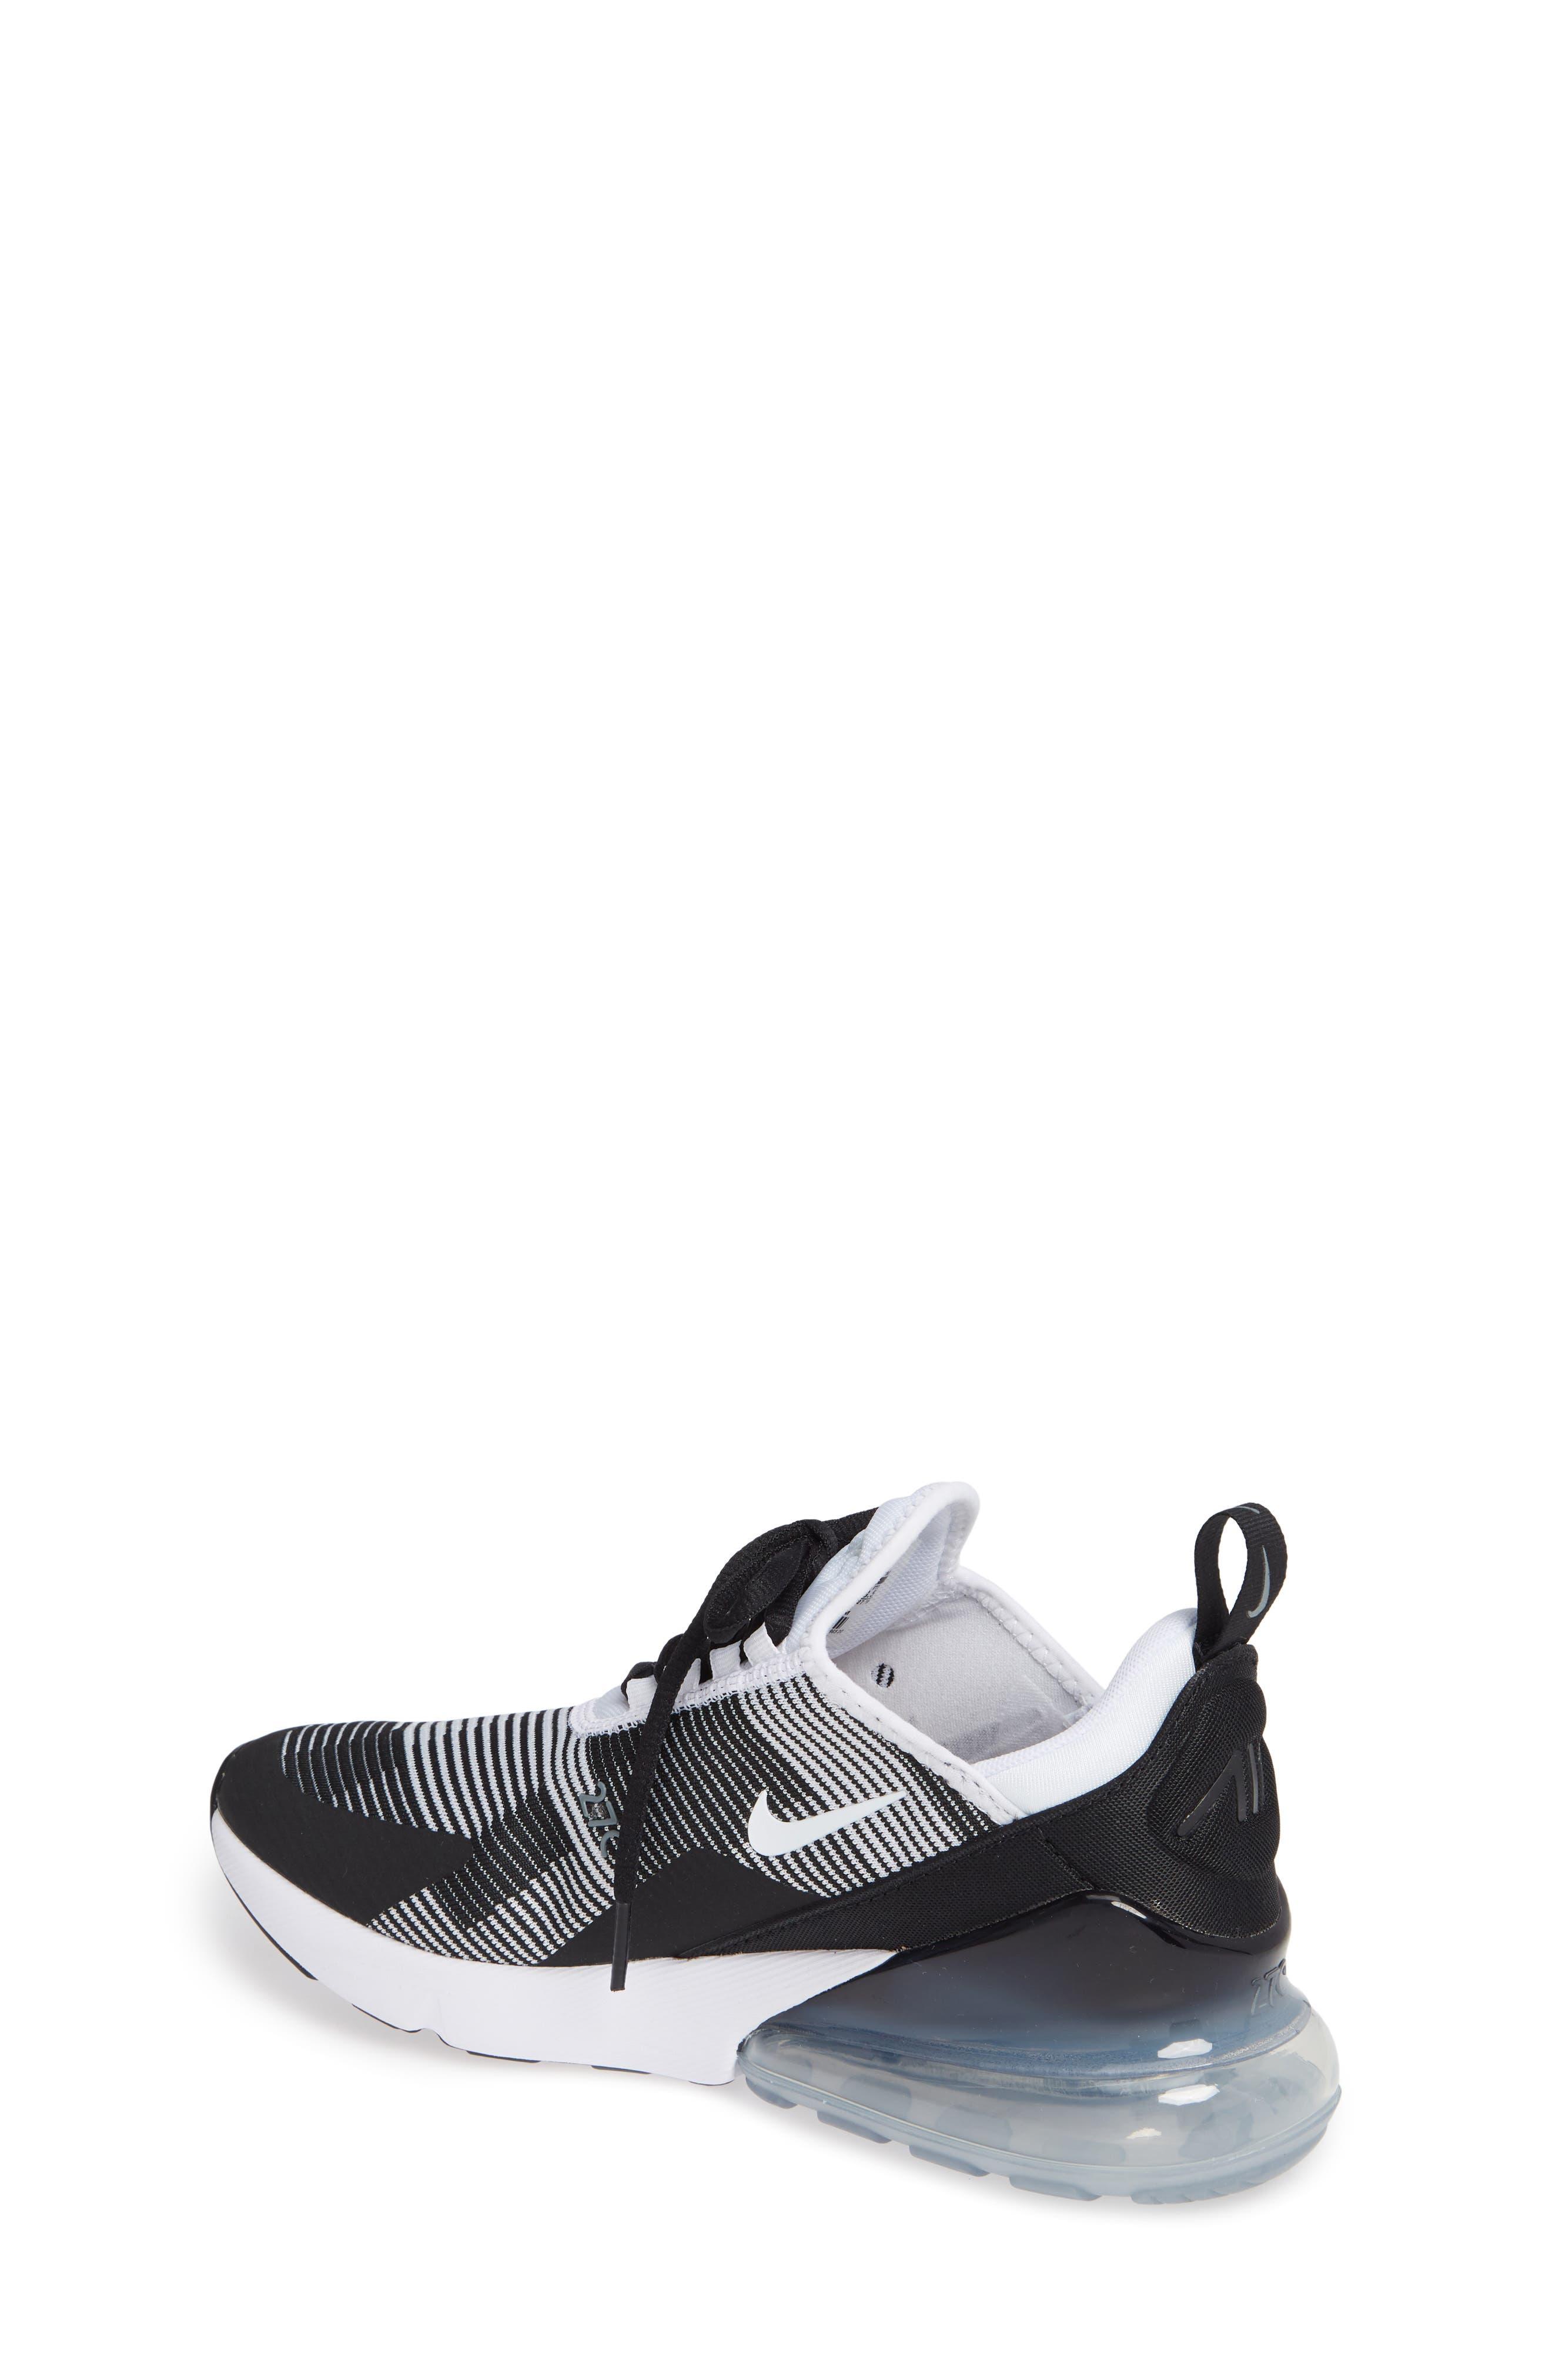 Air Max 270 Sneaker,                             Alternate thumbnail 2, color,                             BLACK/ WHITE/ GREY/ SILVER